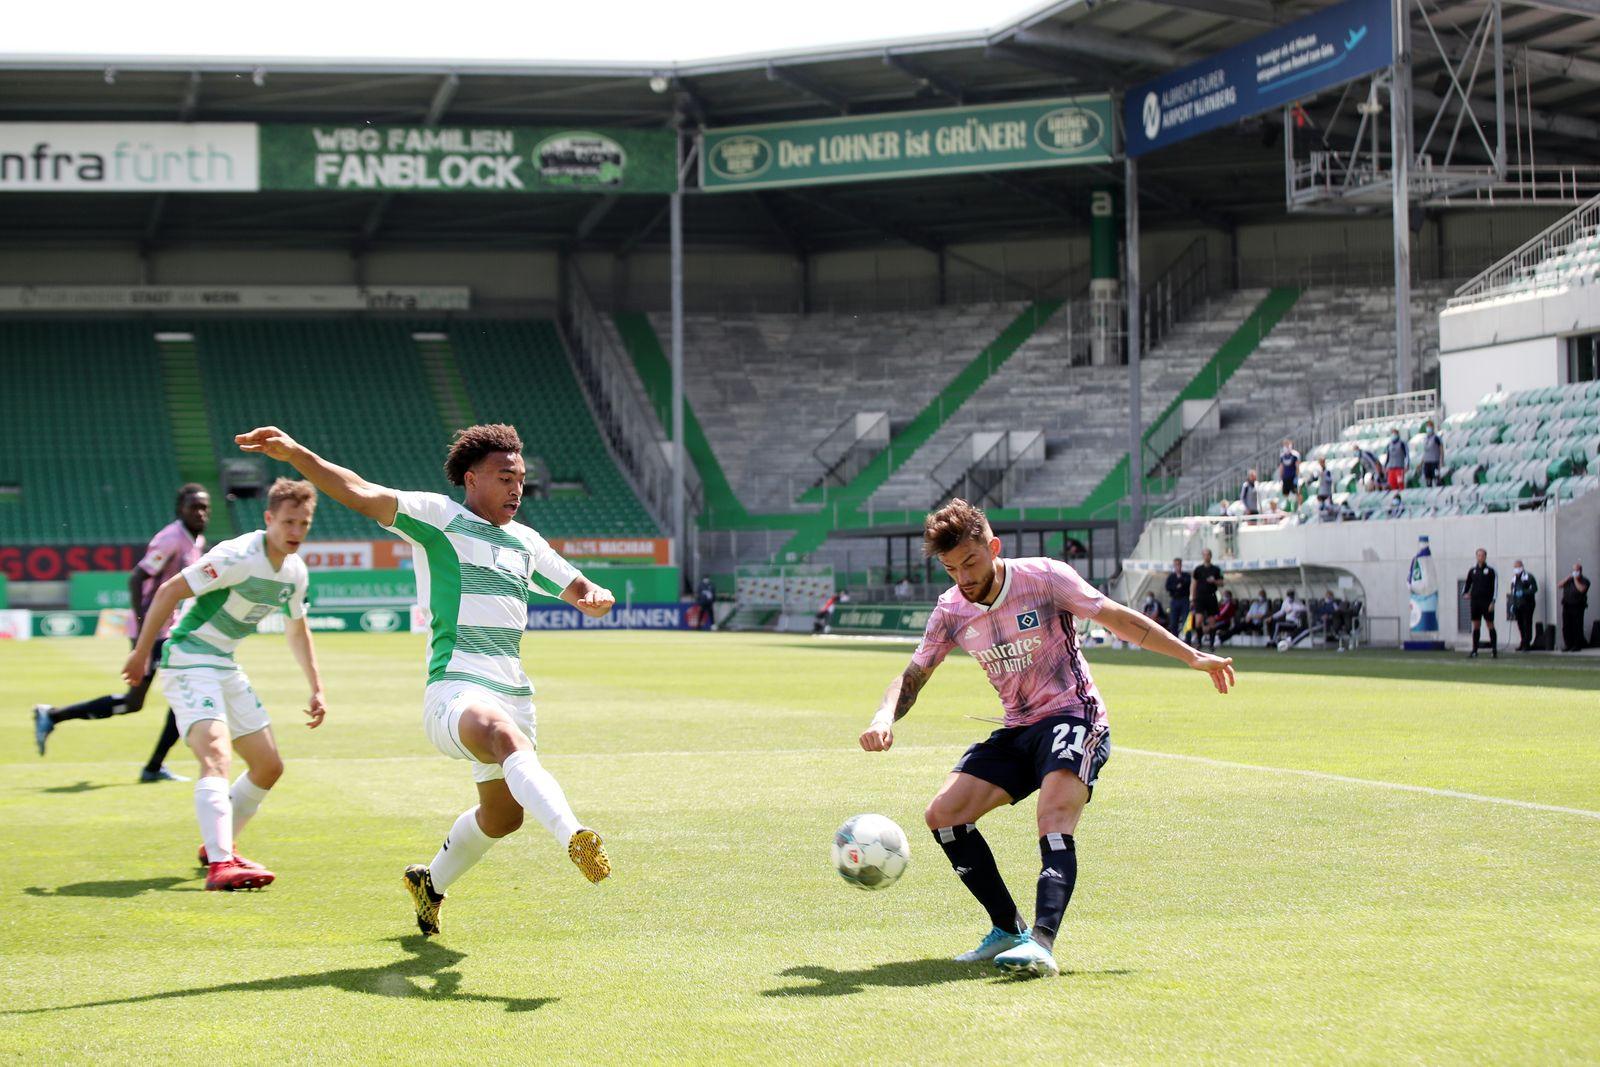 SpVgg Greuther Fuerth vs Hamburger SV, Germany - 17 May 2020